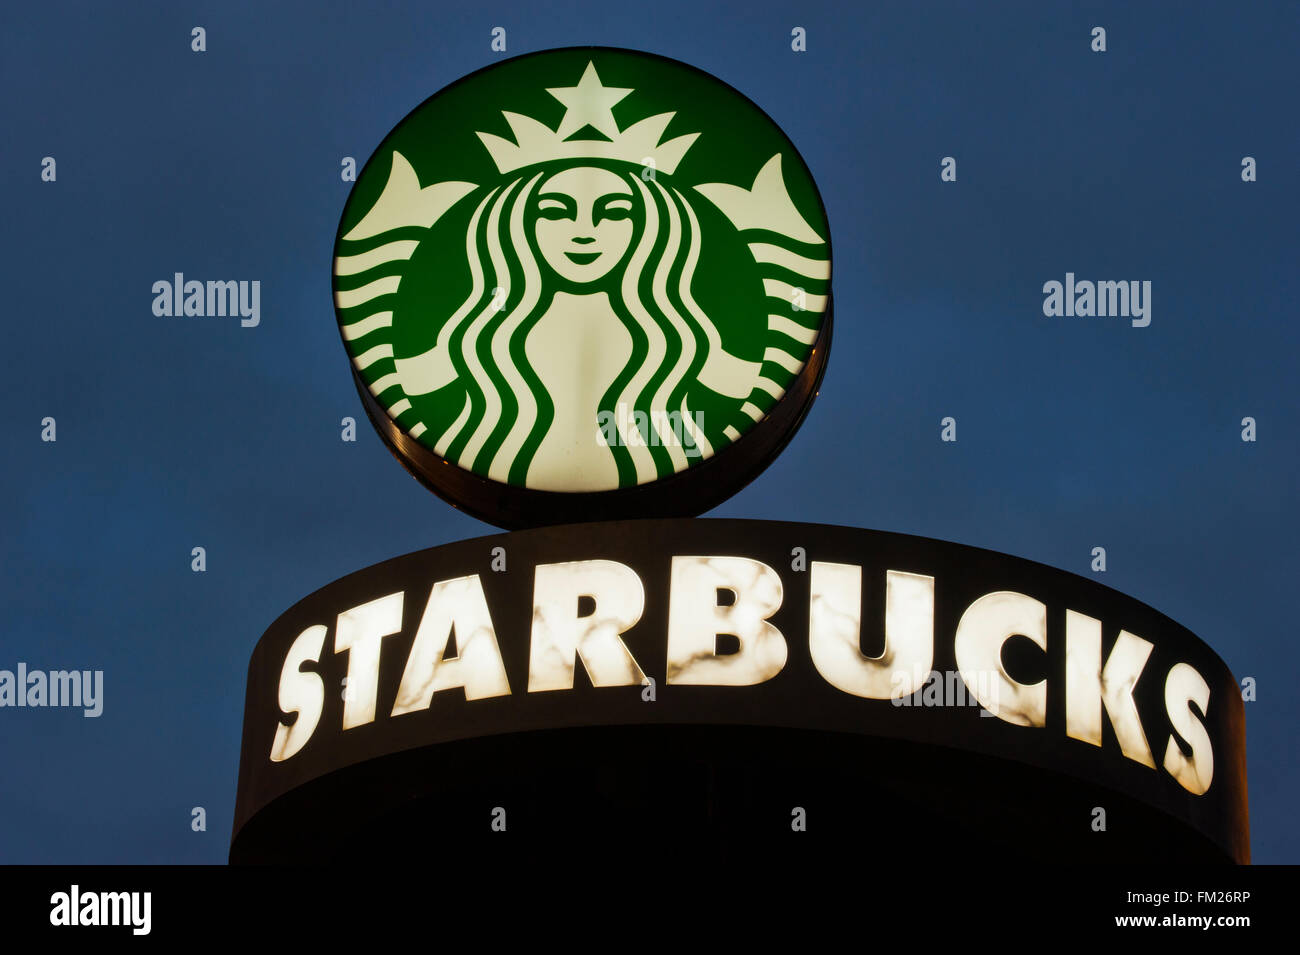 Starbucks logo at entrance to Corporate headquarters, Seattle, Washington - Stock Image